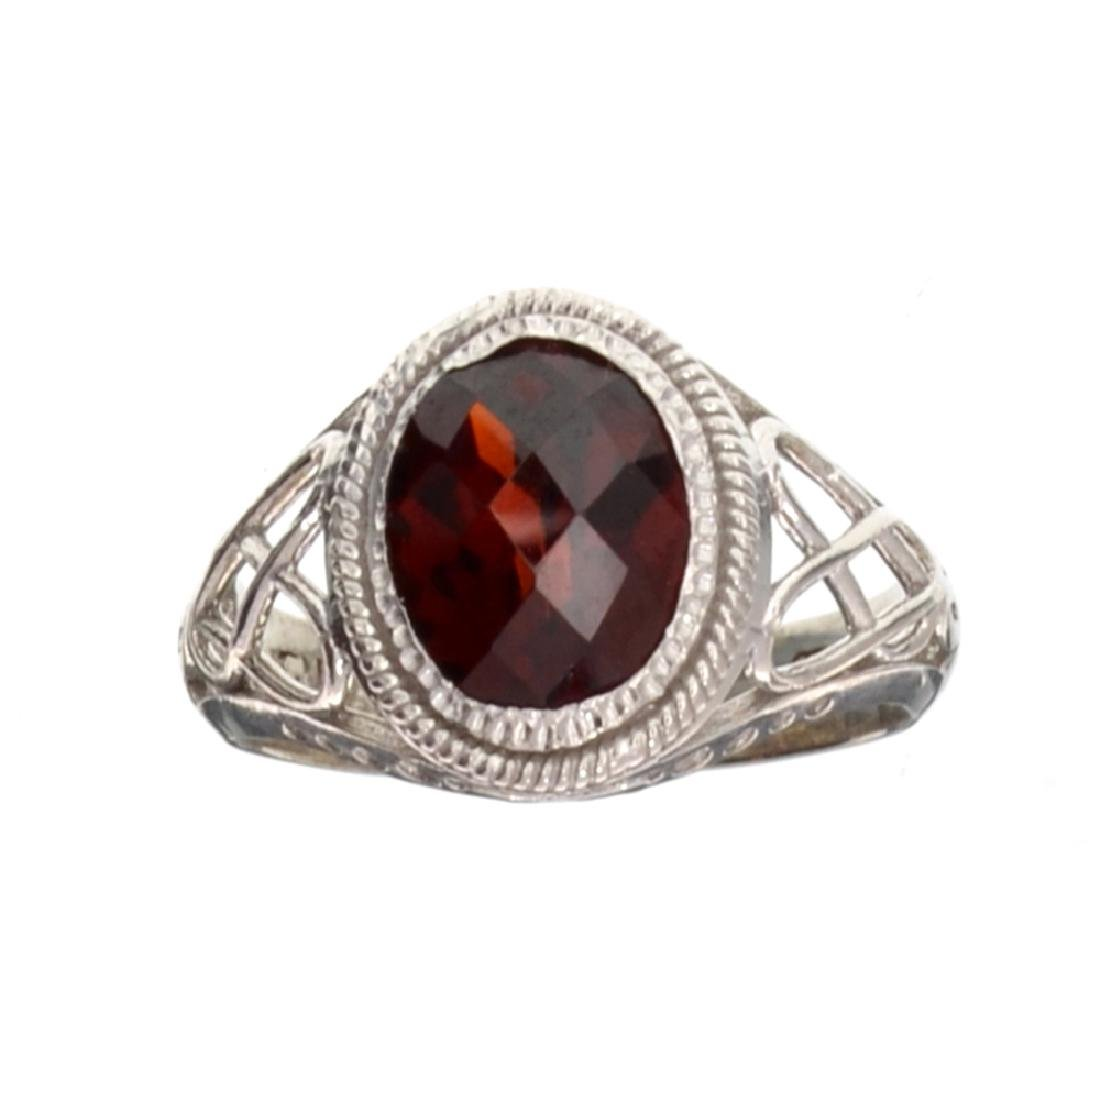 APP: 0.5k Fine Jewelry Designer Sebastian 0.87CT Oval